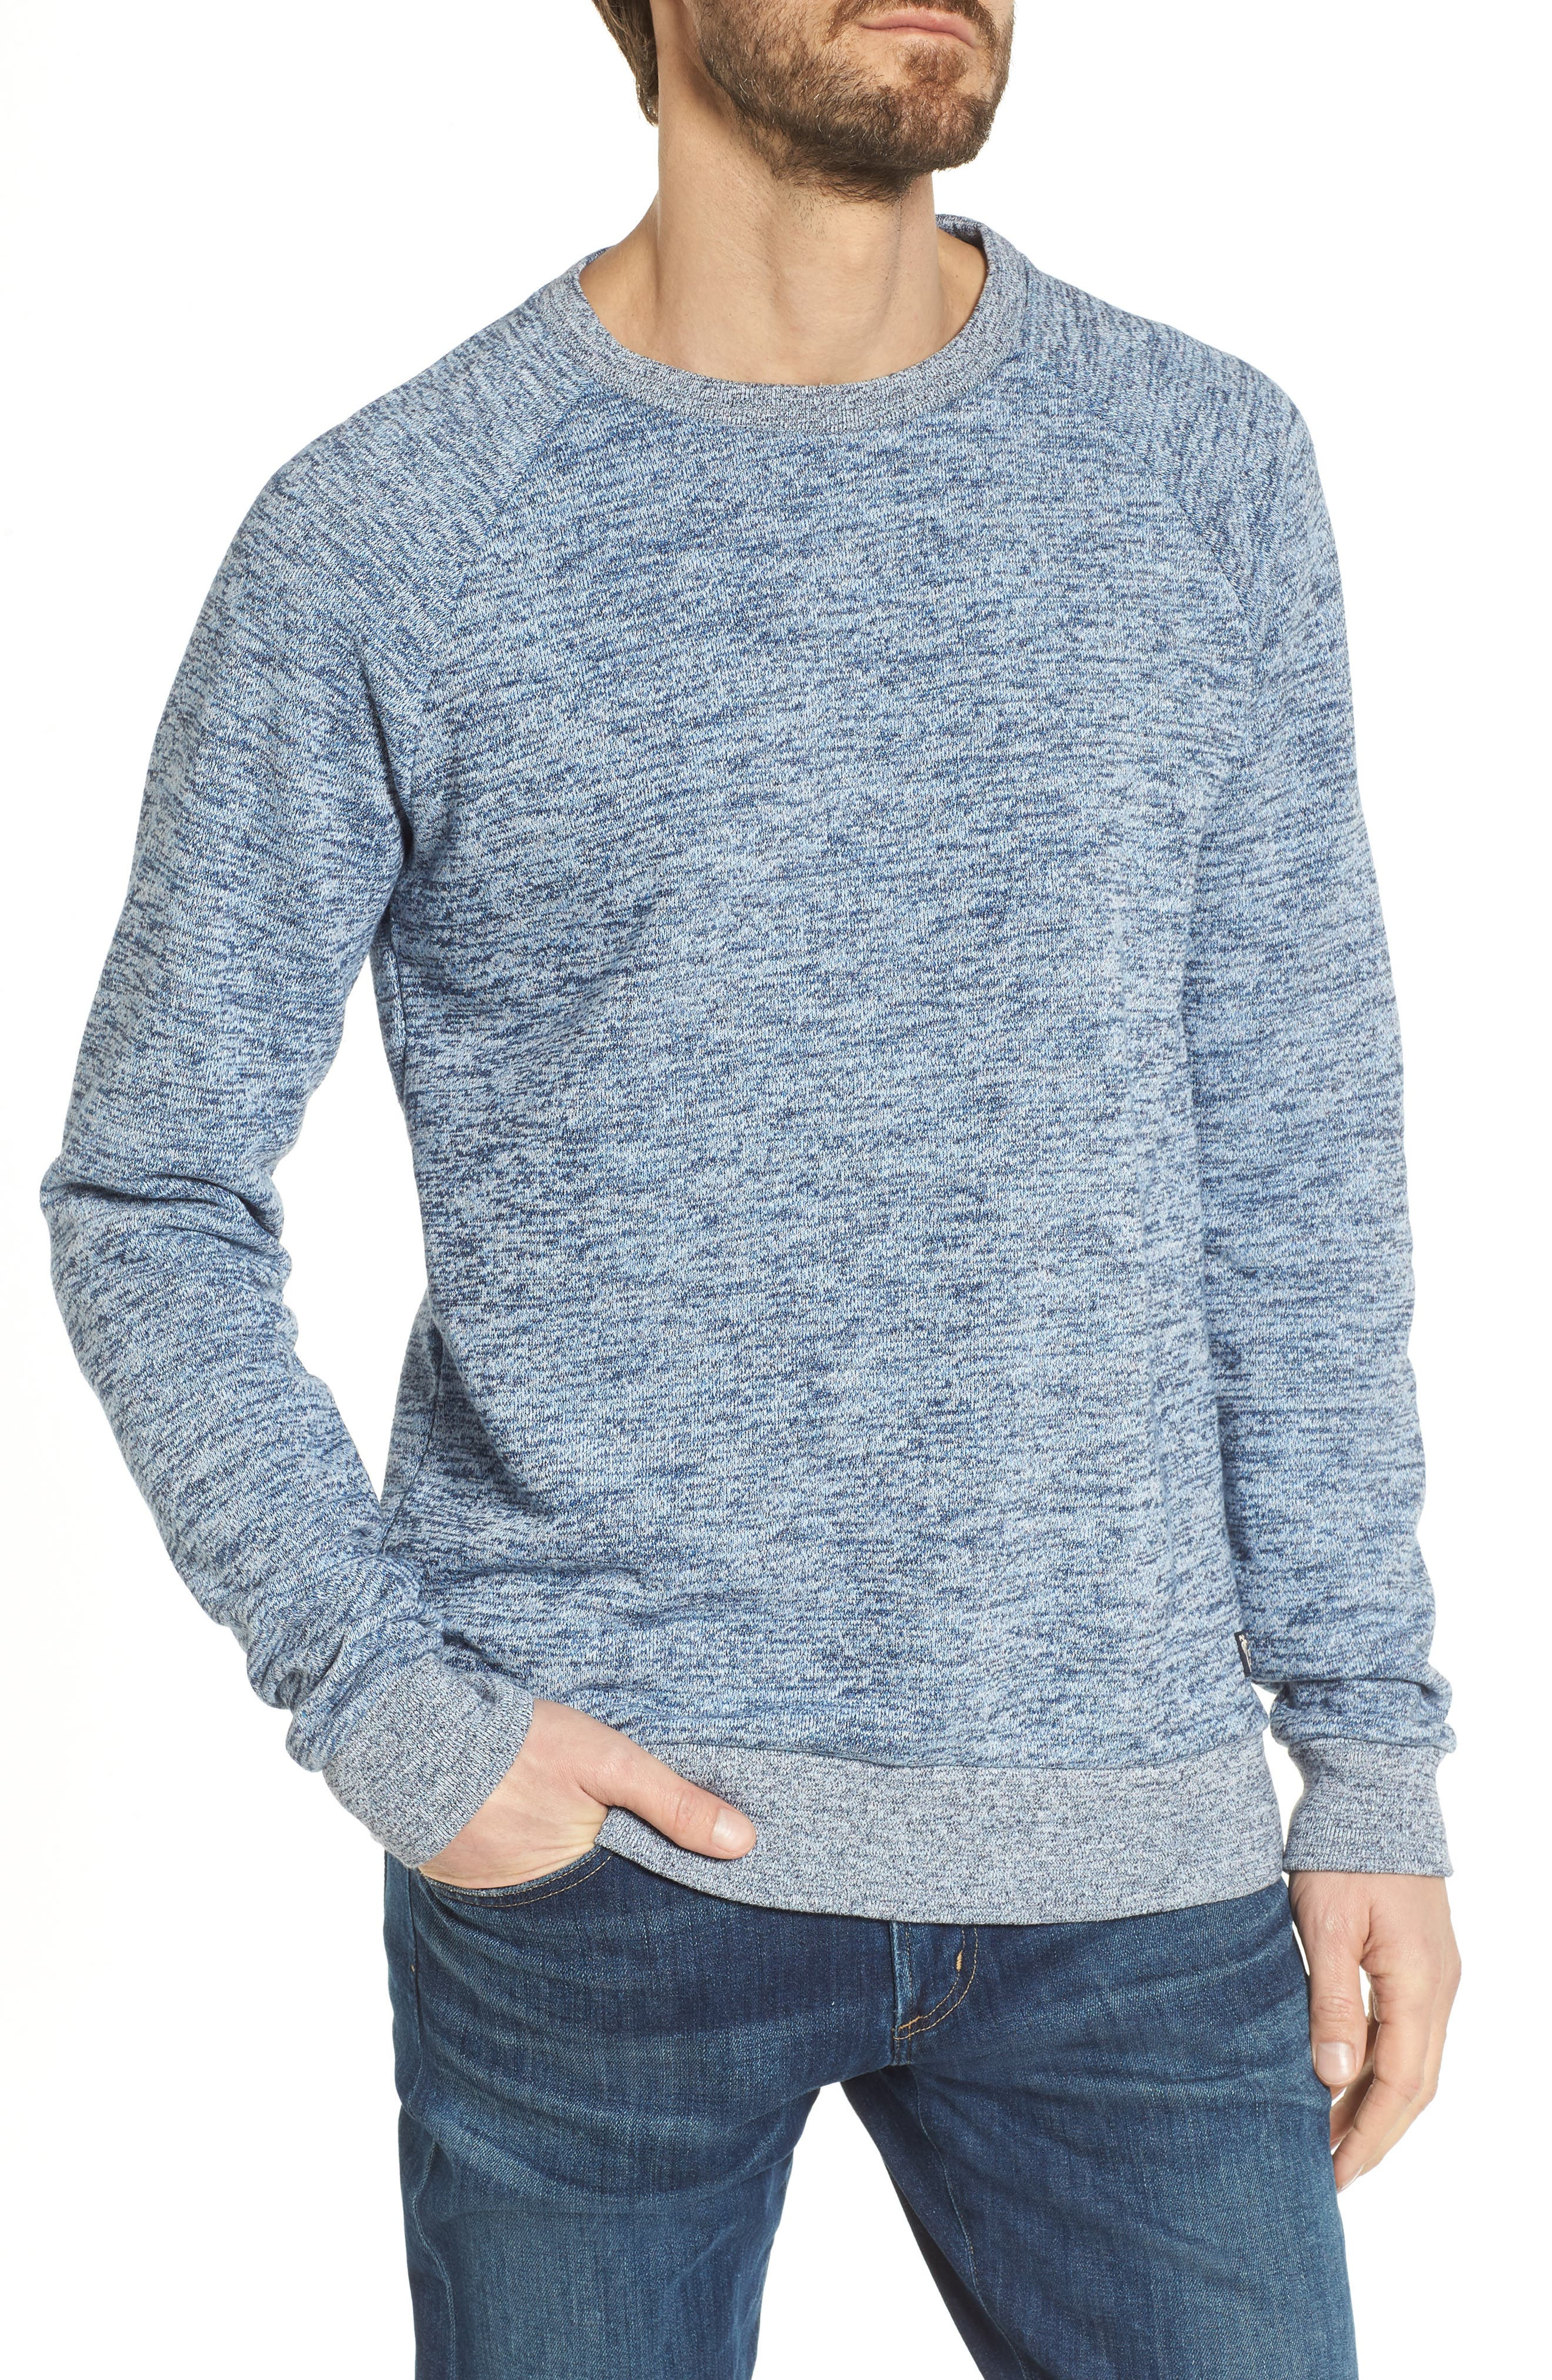 Alternate Image 1 Selected - Scotch & Soda Mélange Sweatshirt